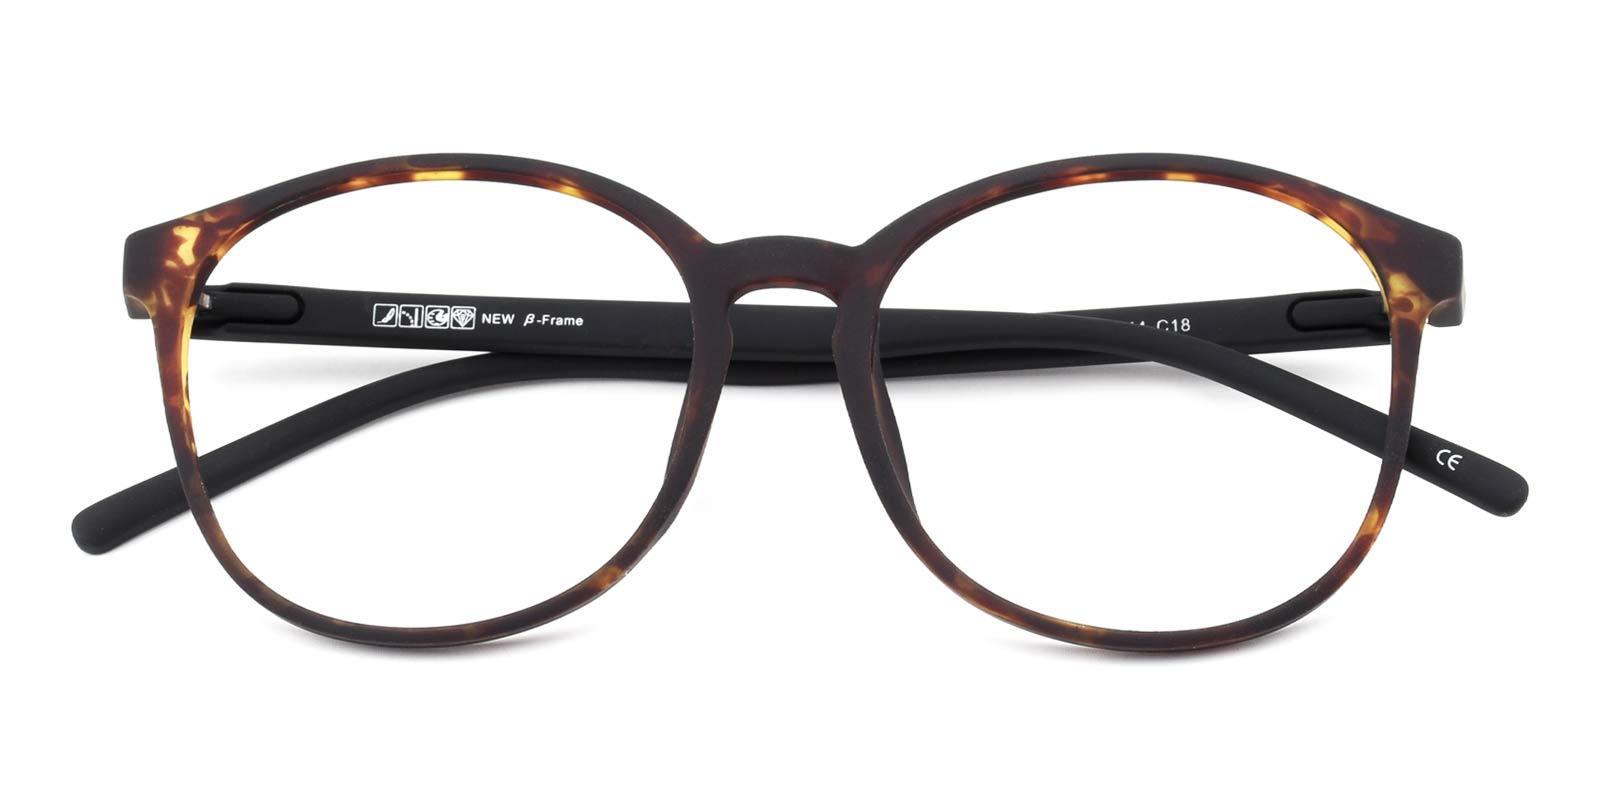 Kolins-Tortoise-Square-TR-Eyeglasses-detail